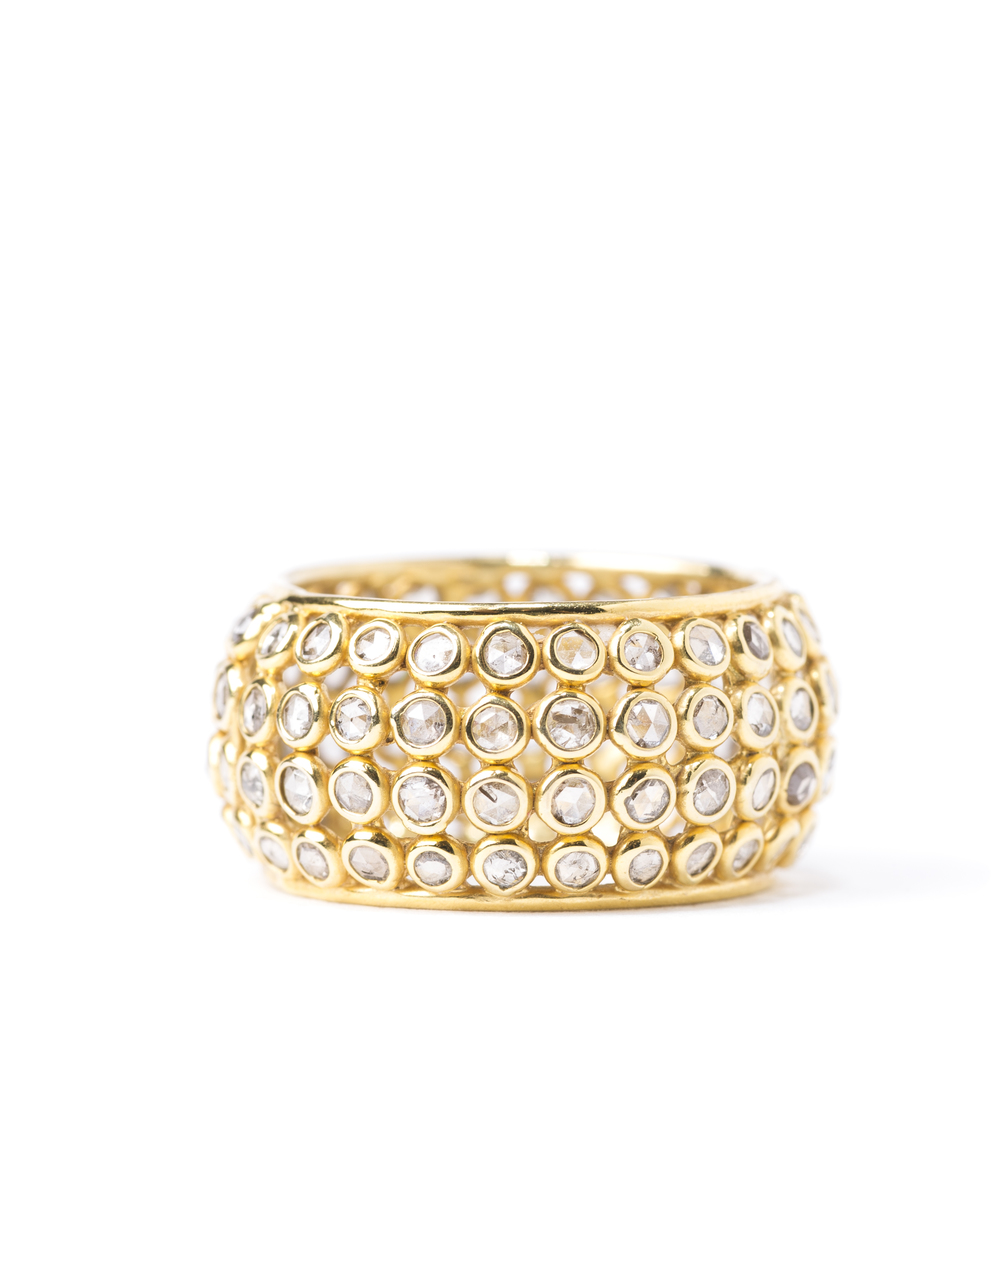 151 18k gold circles ring.jpg